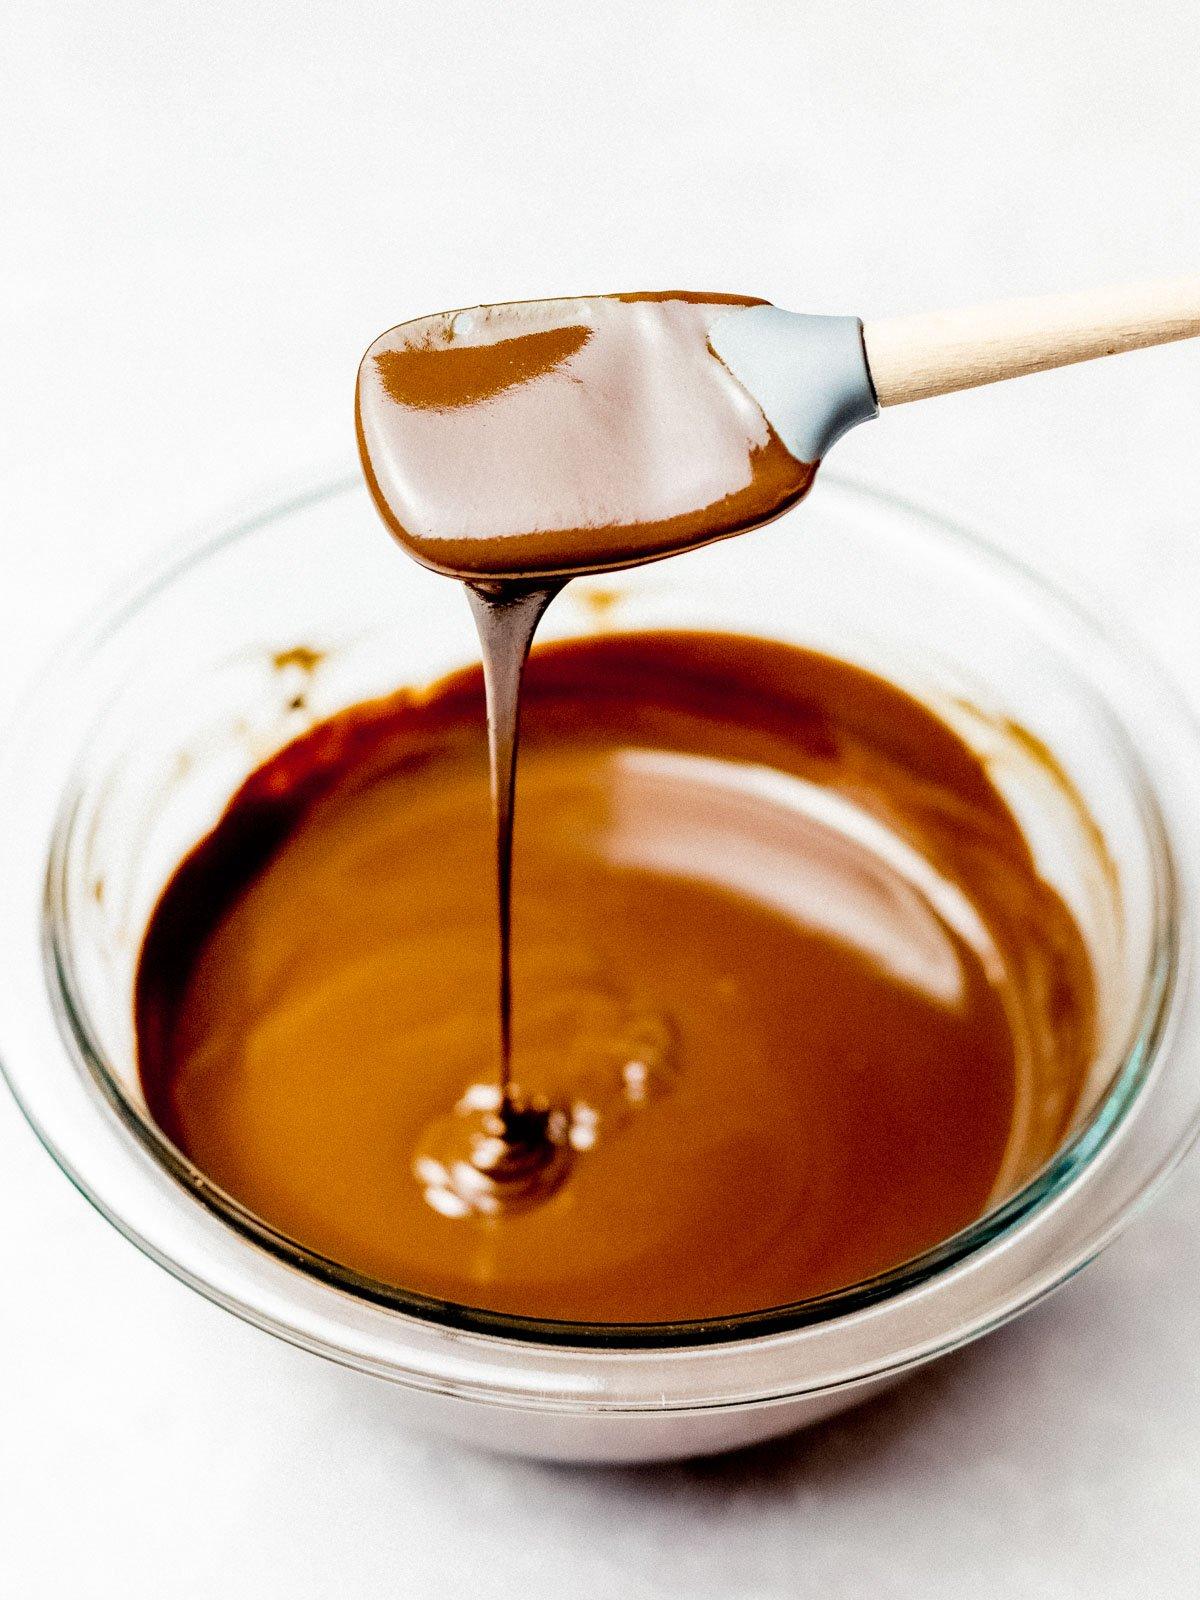 5 Minute Chocolate Ganache for Cakes, Glazes, Dips